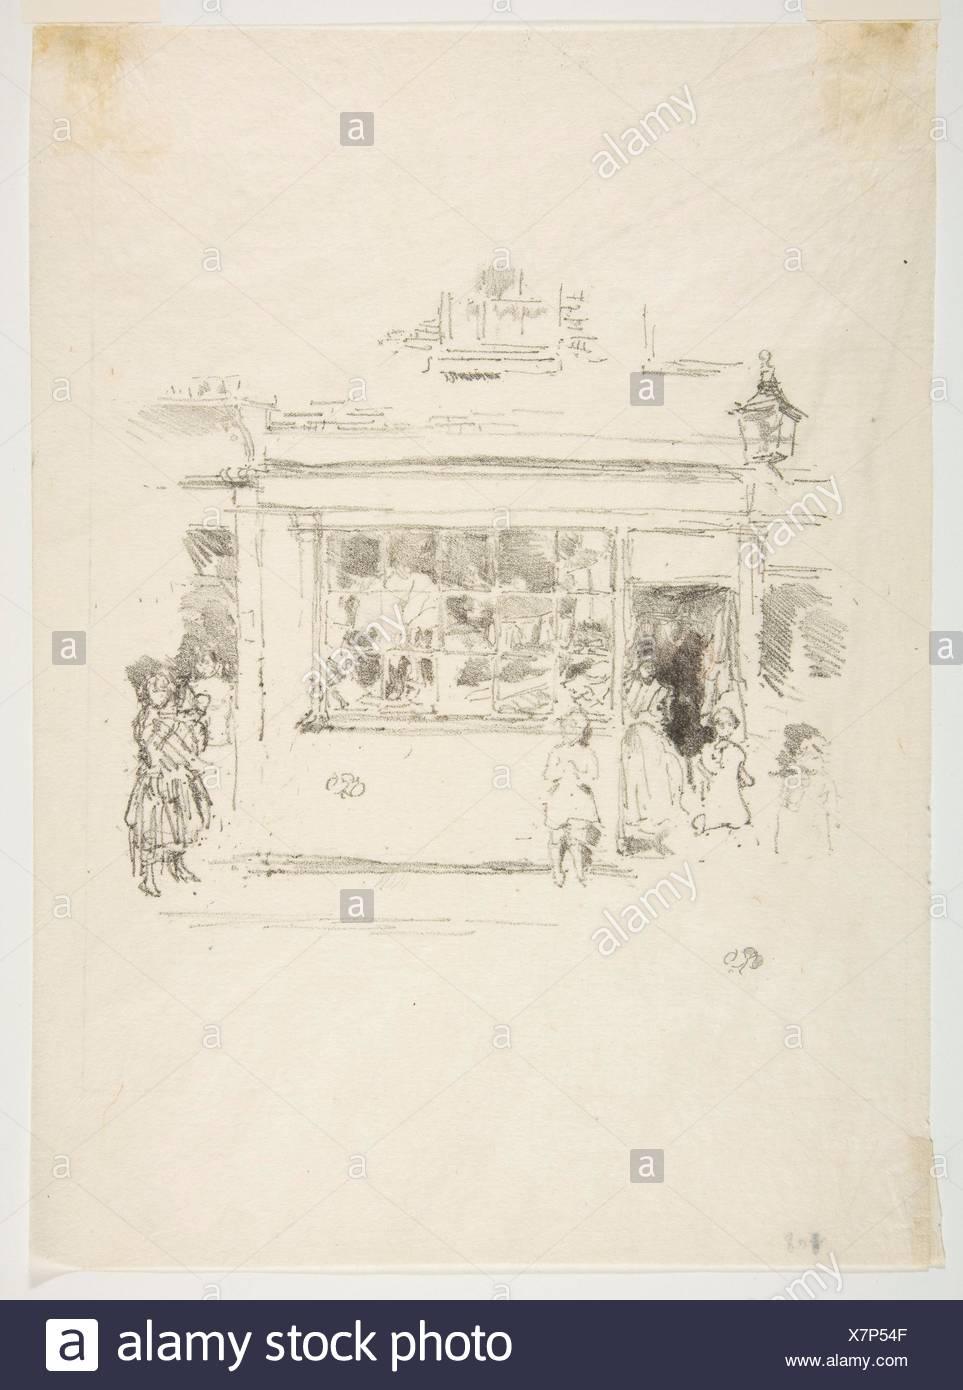 Drury Lane Rags. Artist: James McNeill Whistler (American, Lowell, Massachusetts 1834-1903 London); Date: 1888; Medium: Transfer lithograph, drawn on - Stock Image